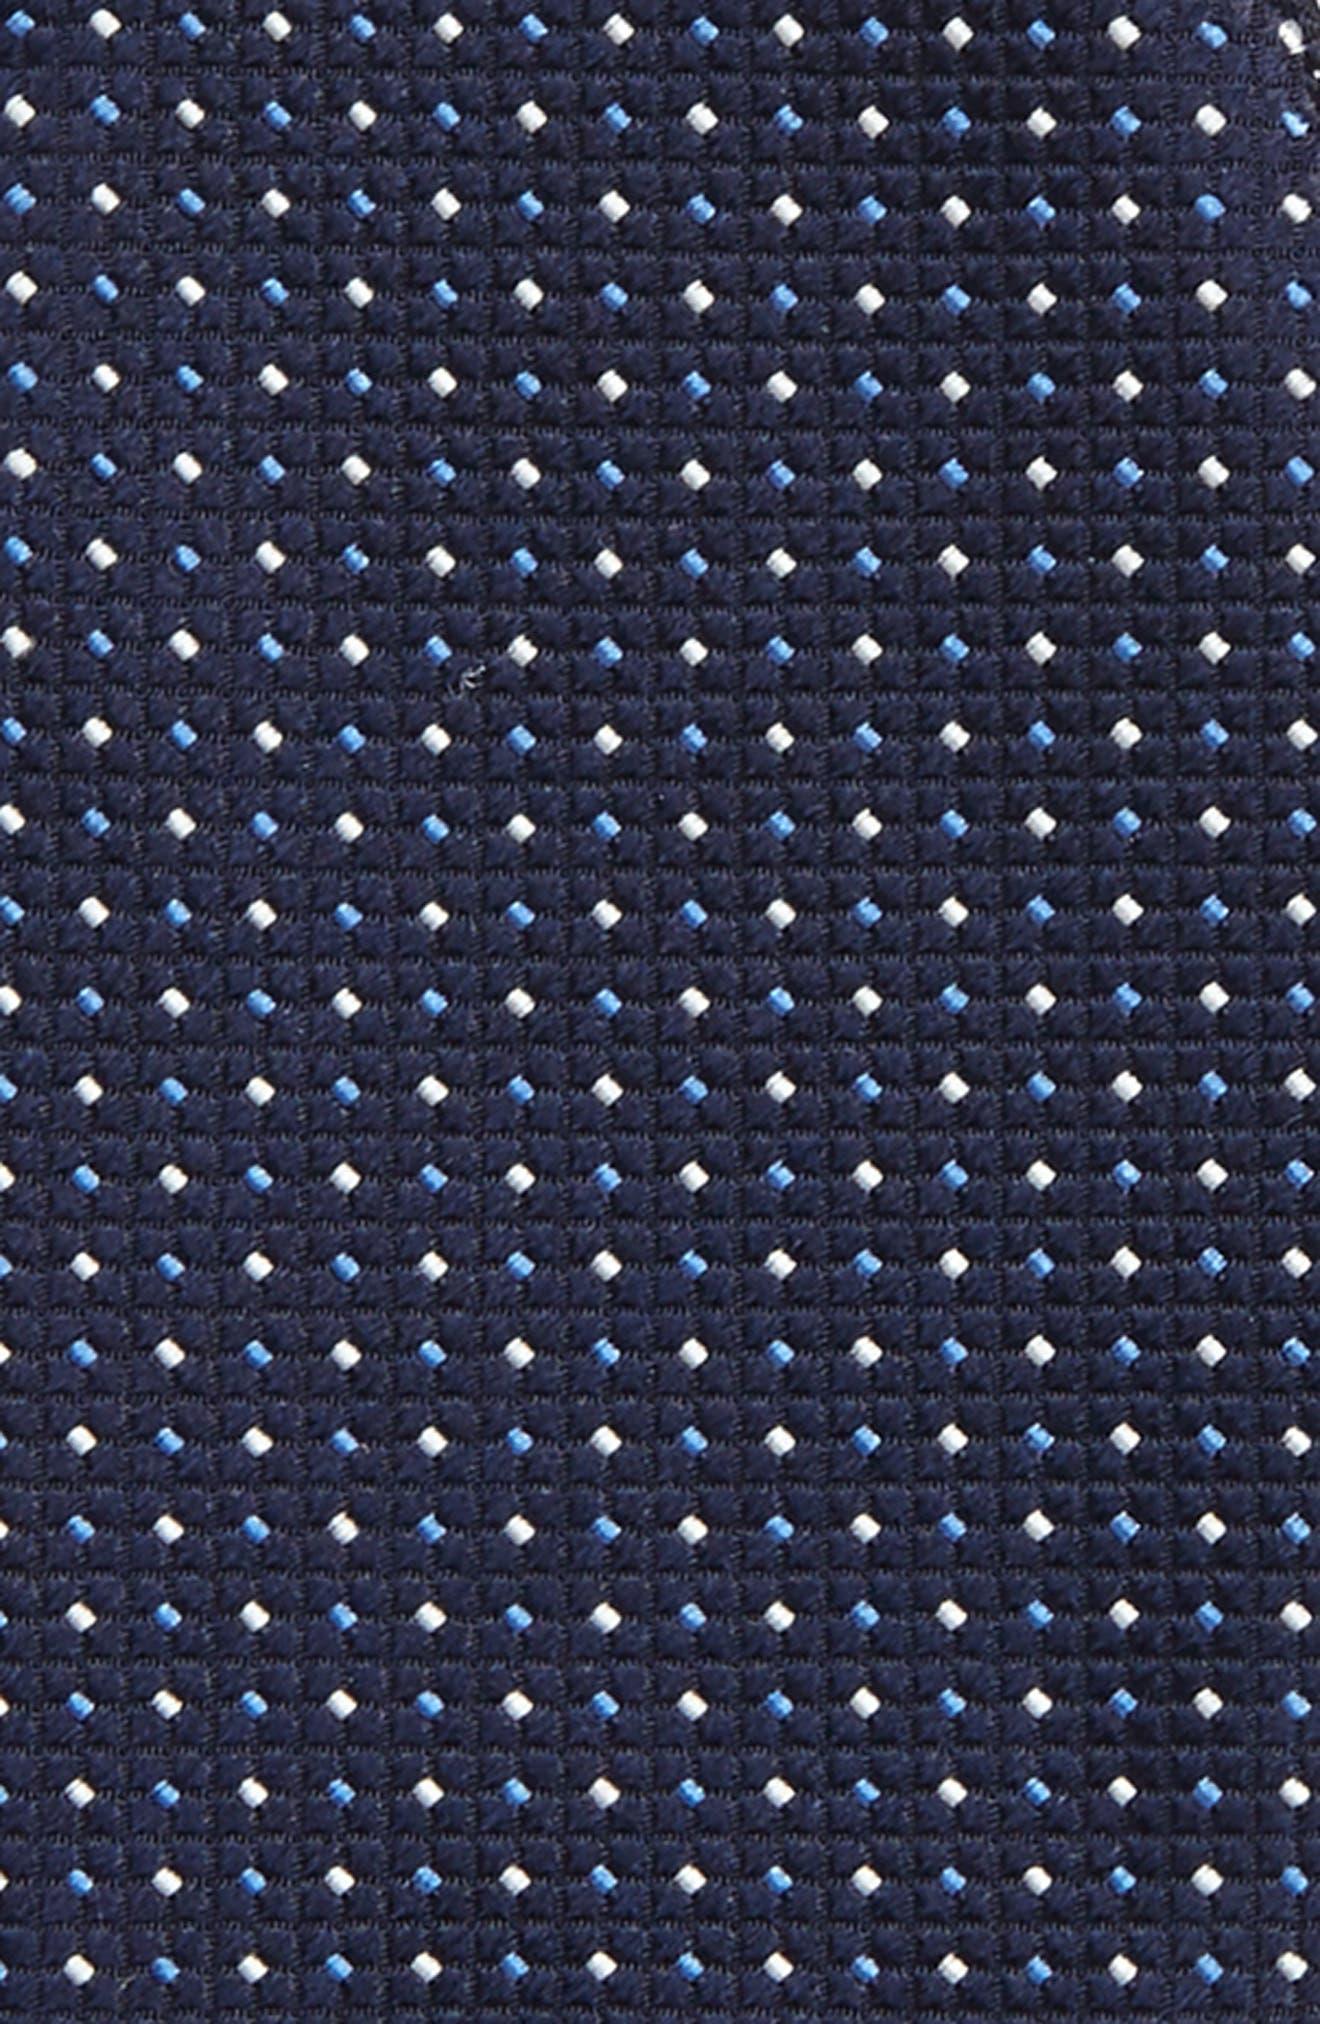 Dot Silk Bow Tie,                             Alternate thumbnail 3, color,                             Navy